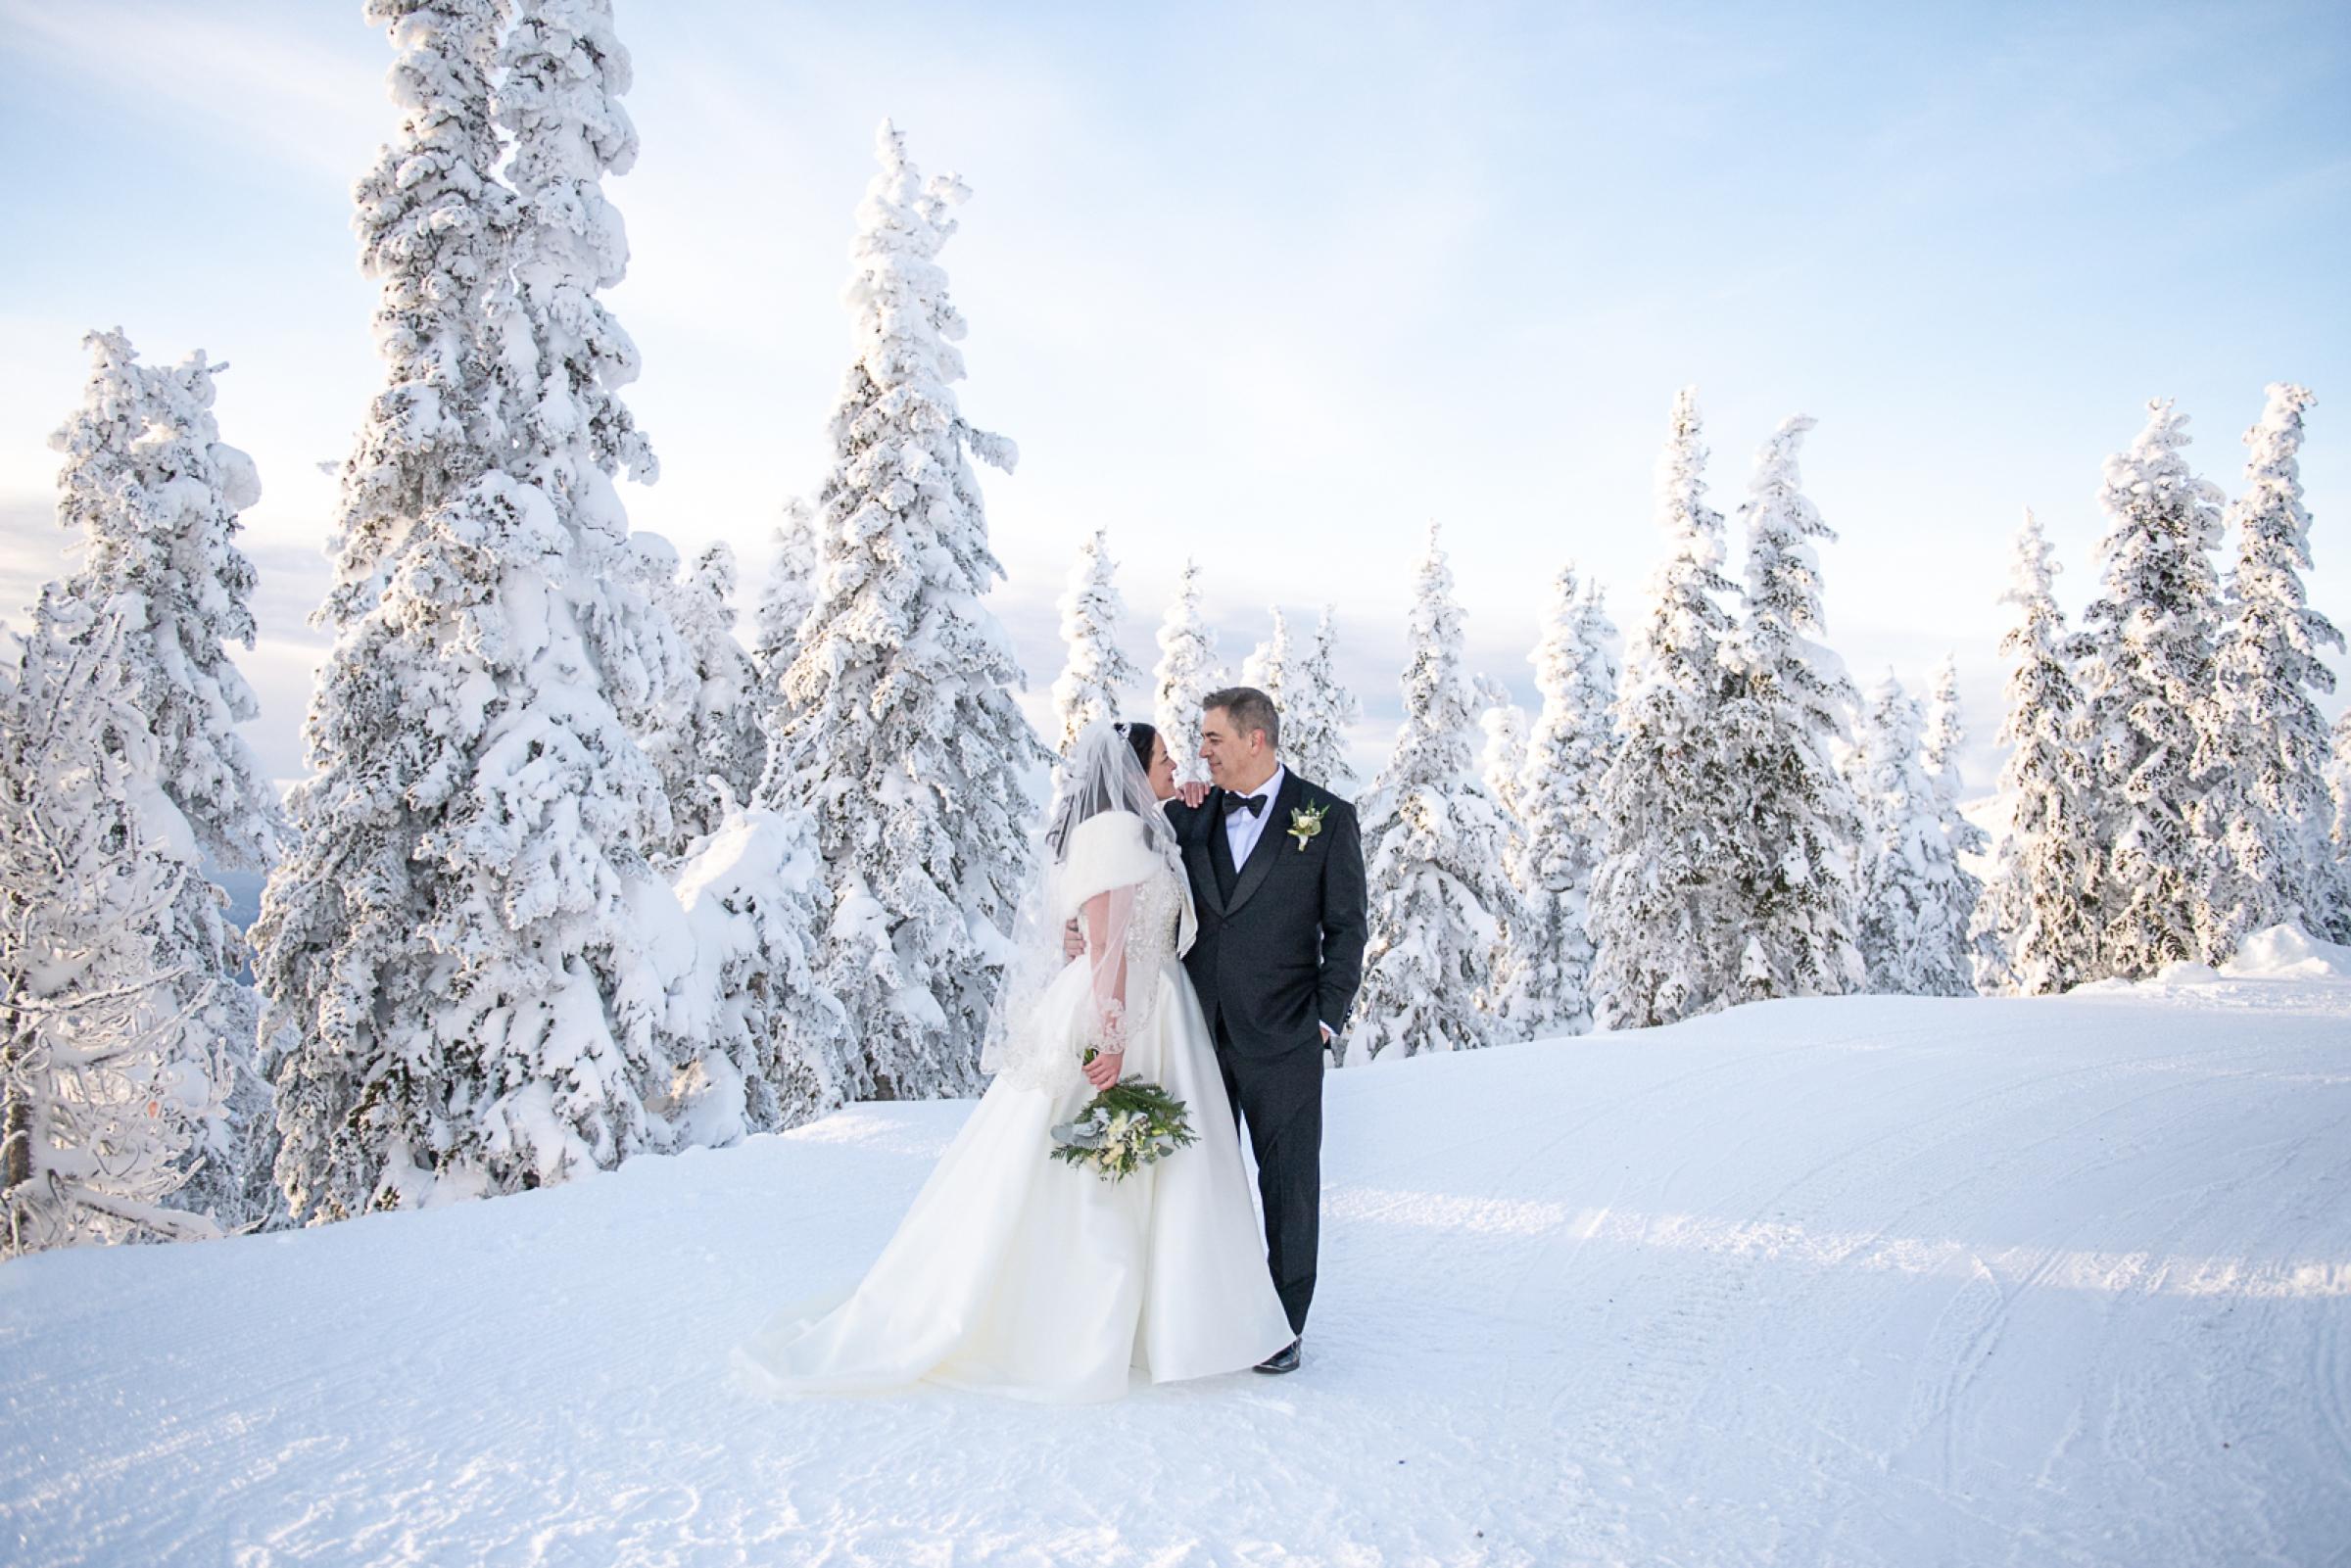 Janel-Gion-Wedding-Photographer-KristinRon-Sandpoint-Idaho.jpg_0021.jpg